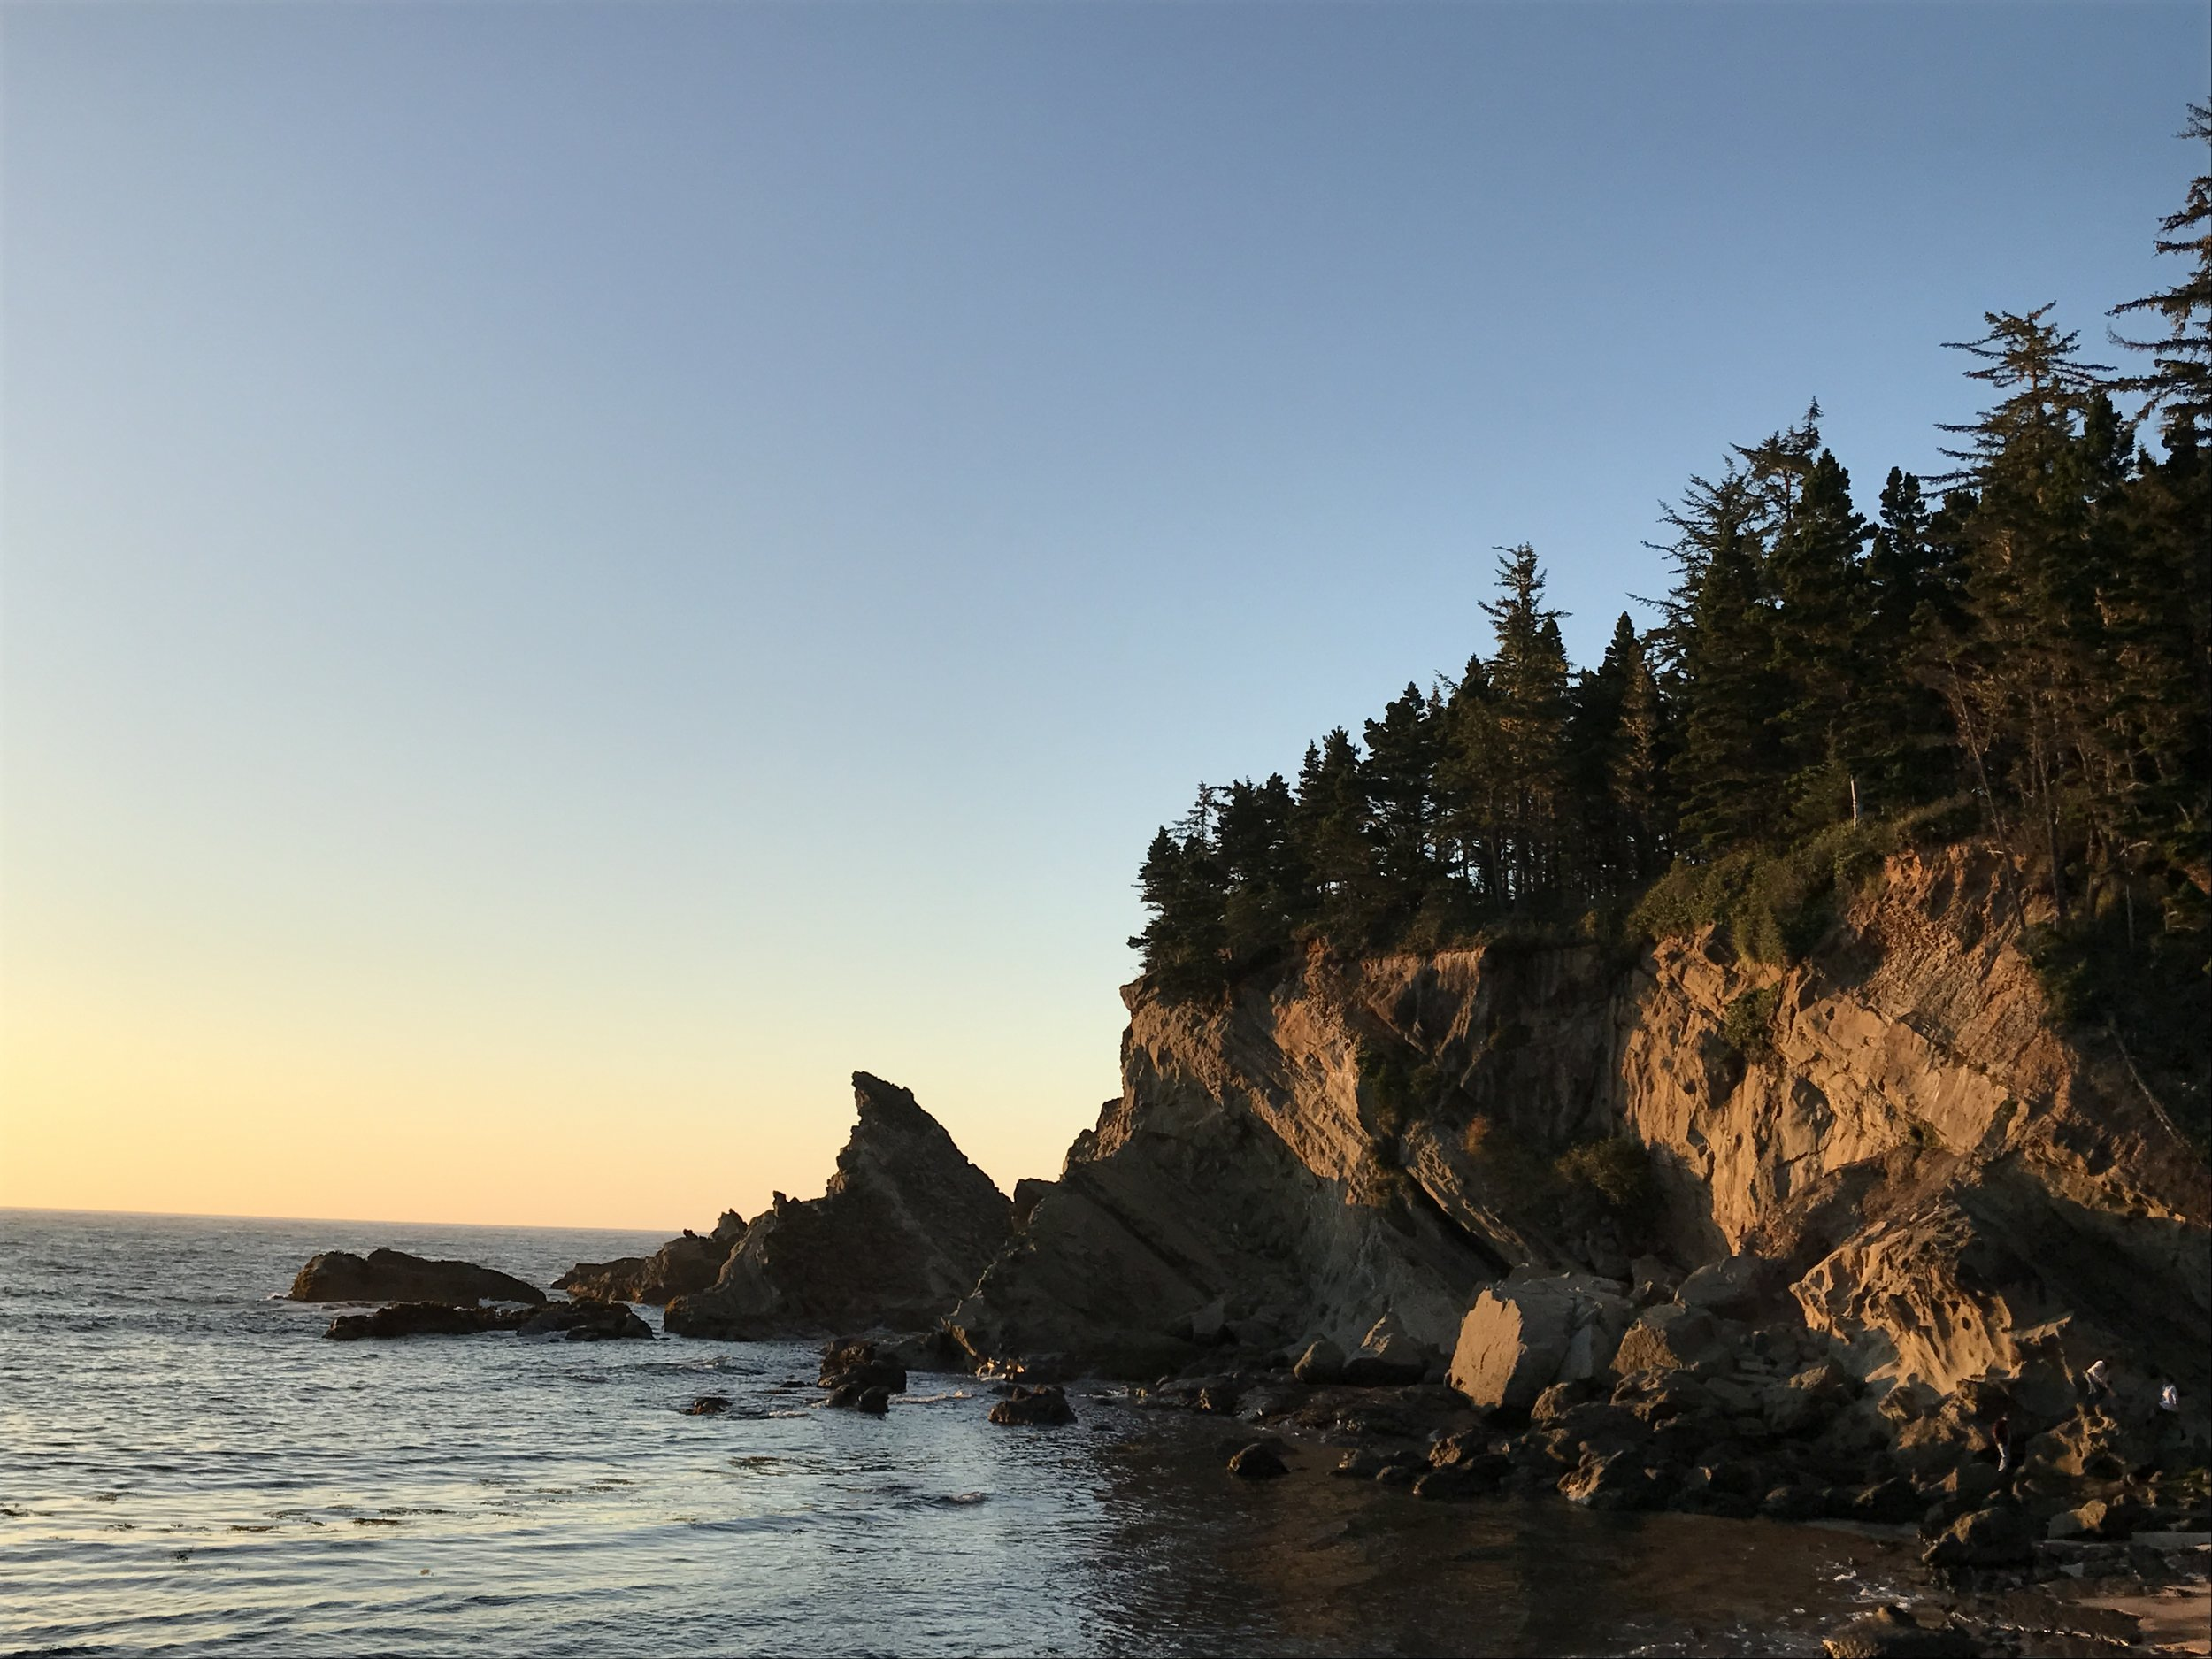 coos bay sunset beach.JPG